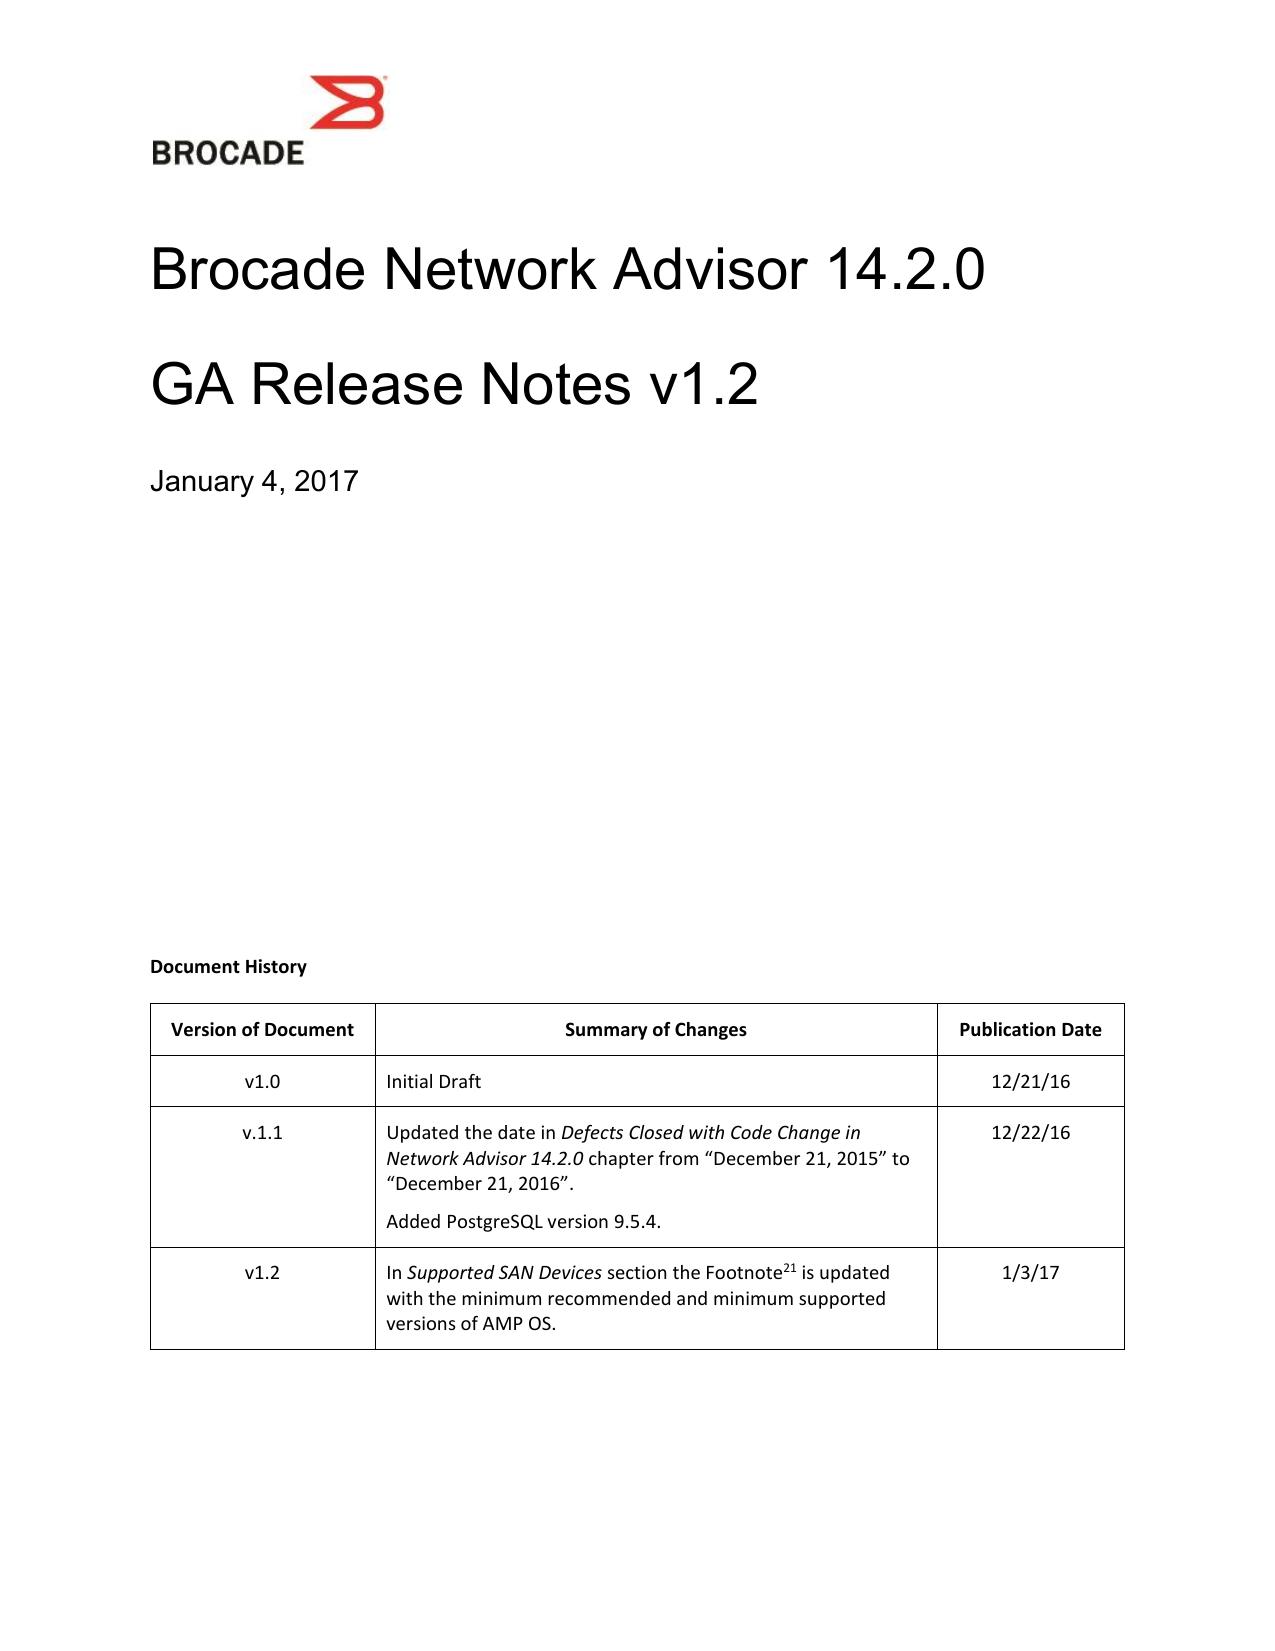 Brocade Network Advisor 14 2 0 GA Release Notes v1 2